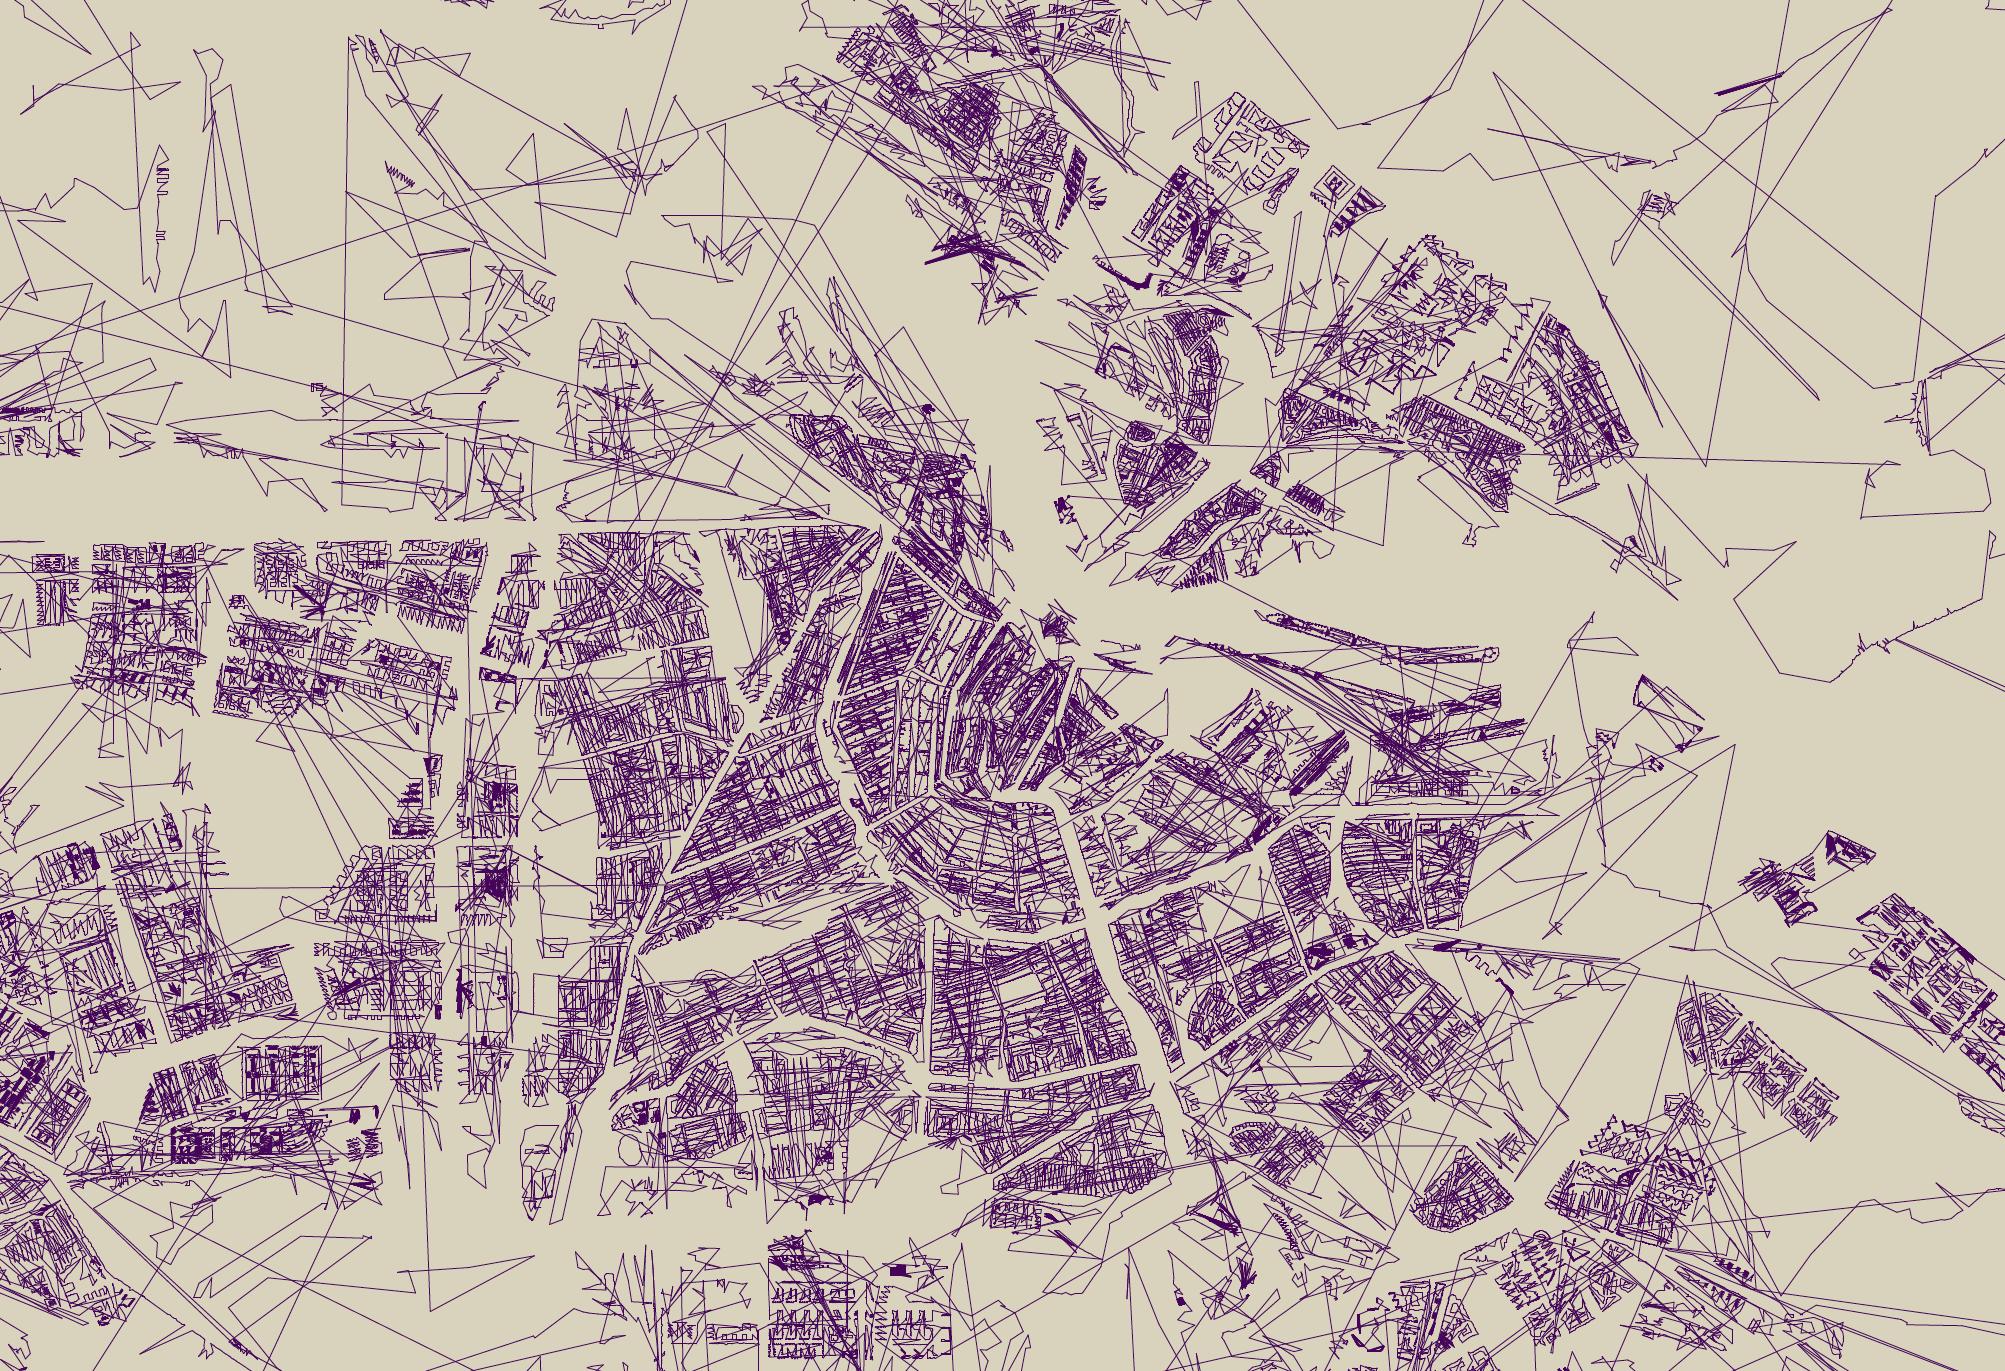 zipscribble_detail_Amsterdam